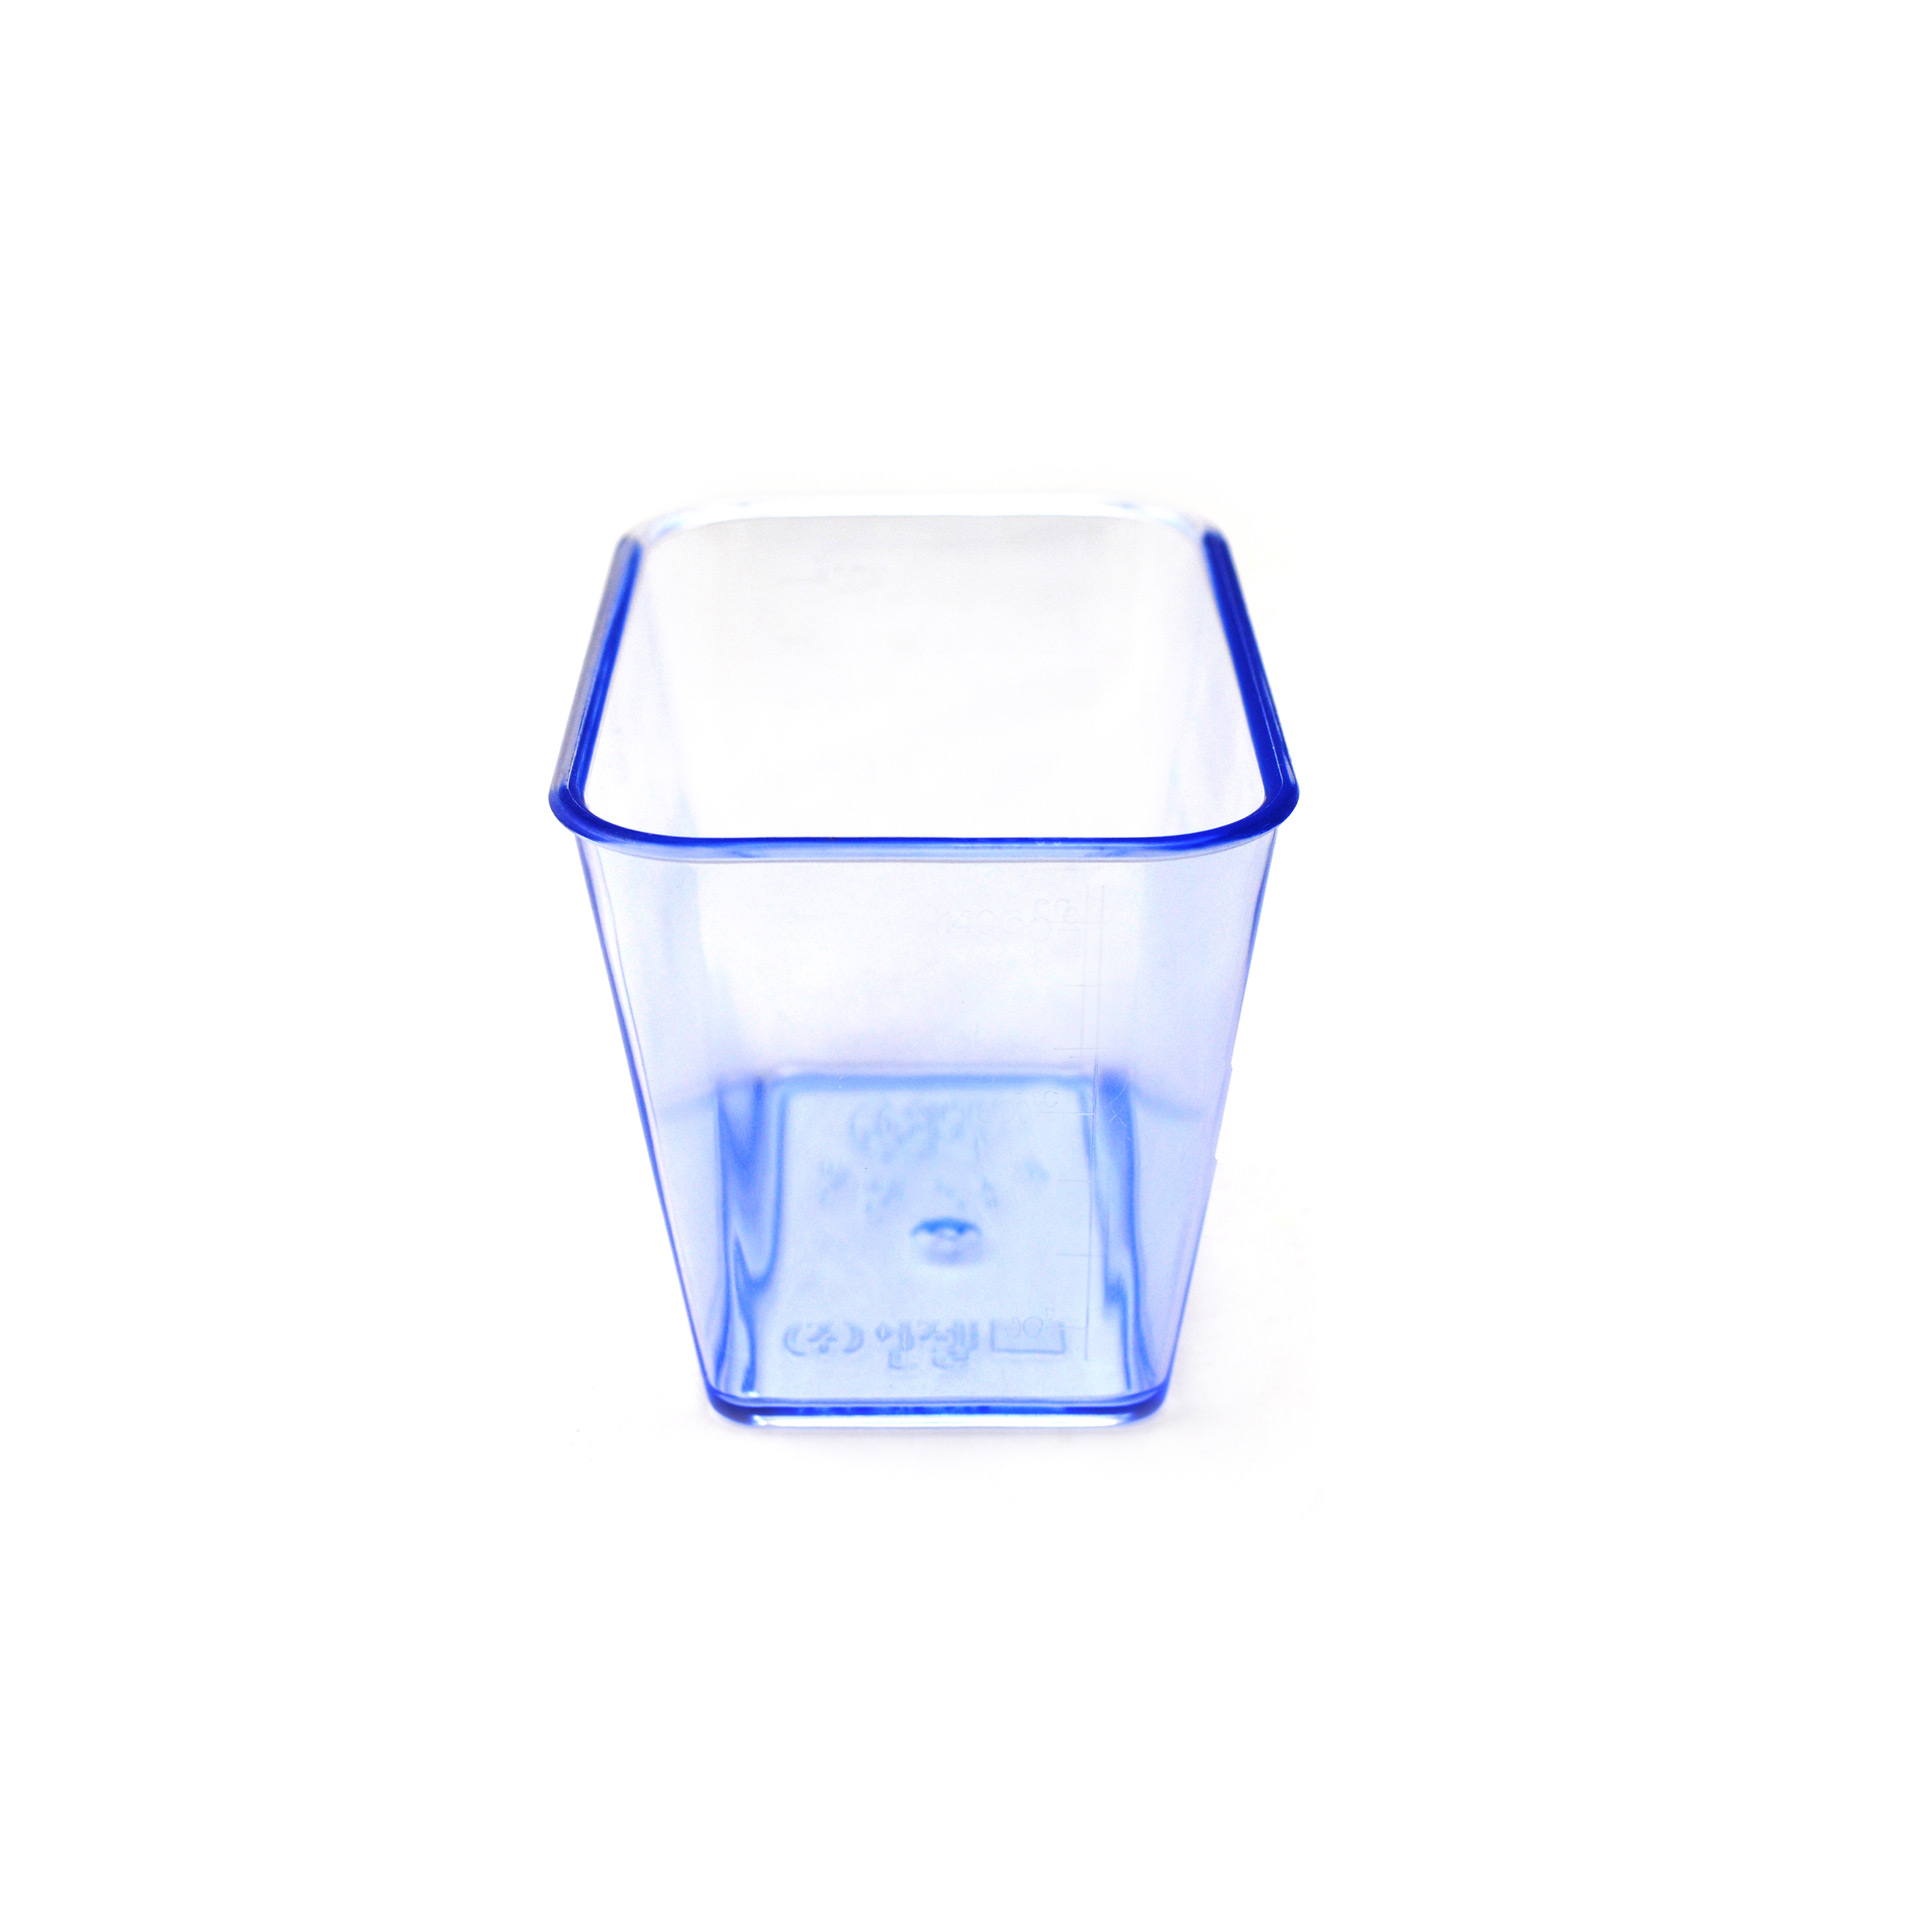 Tresterbehälter aus Kunststoff für alle Angel Juicer Modelle